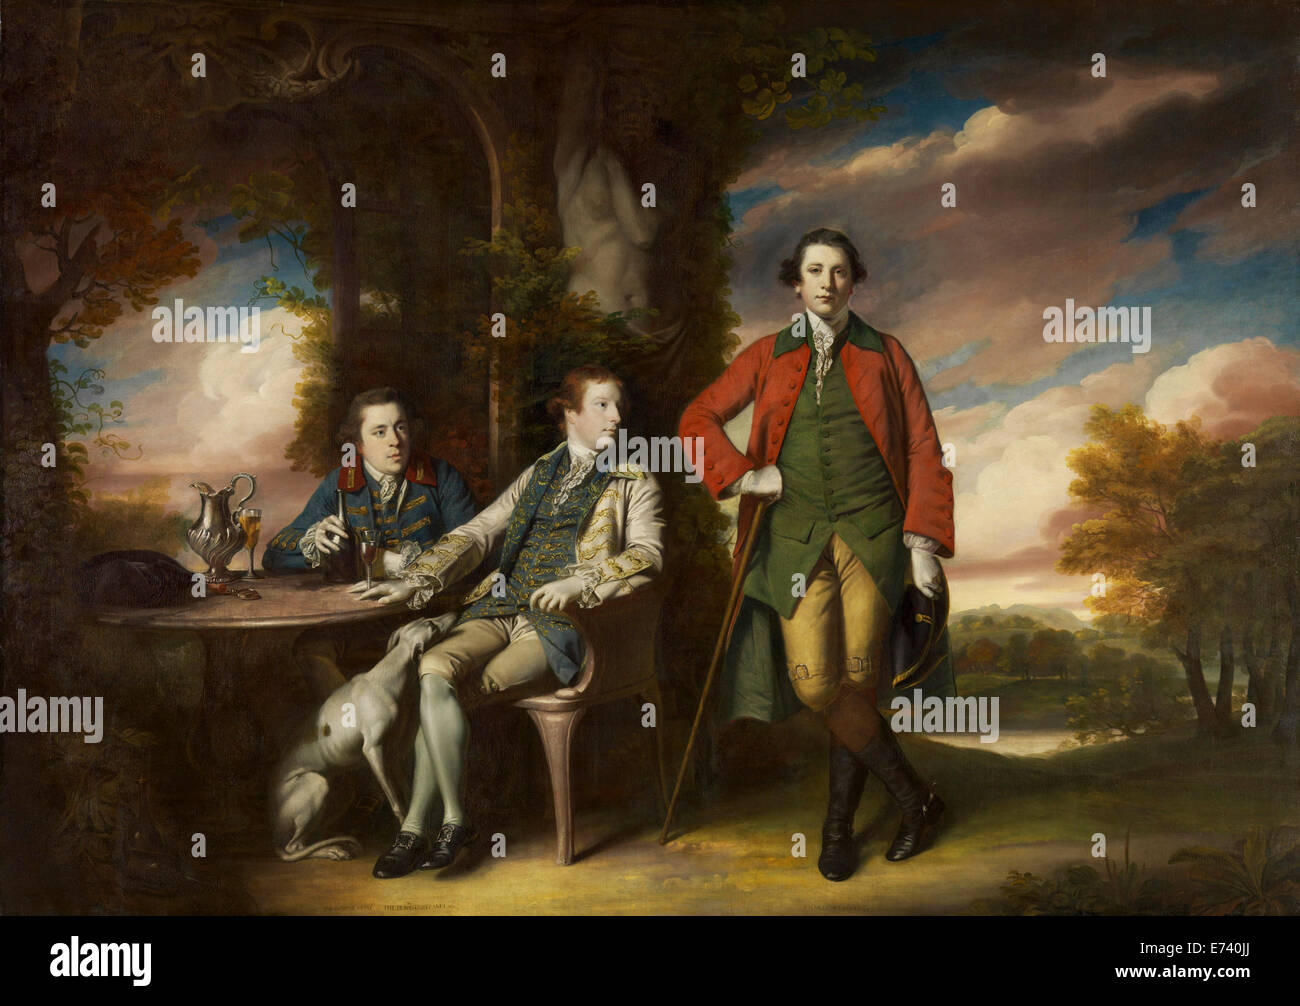 Honorable Henry Fane with Inigo Jones and Charles Blair - by Joshua Reynolds, 1766 - Stock Image